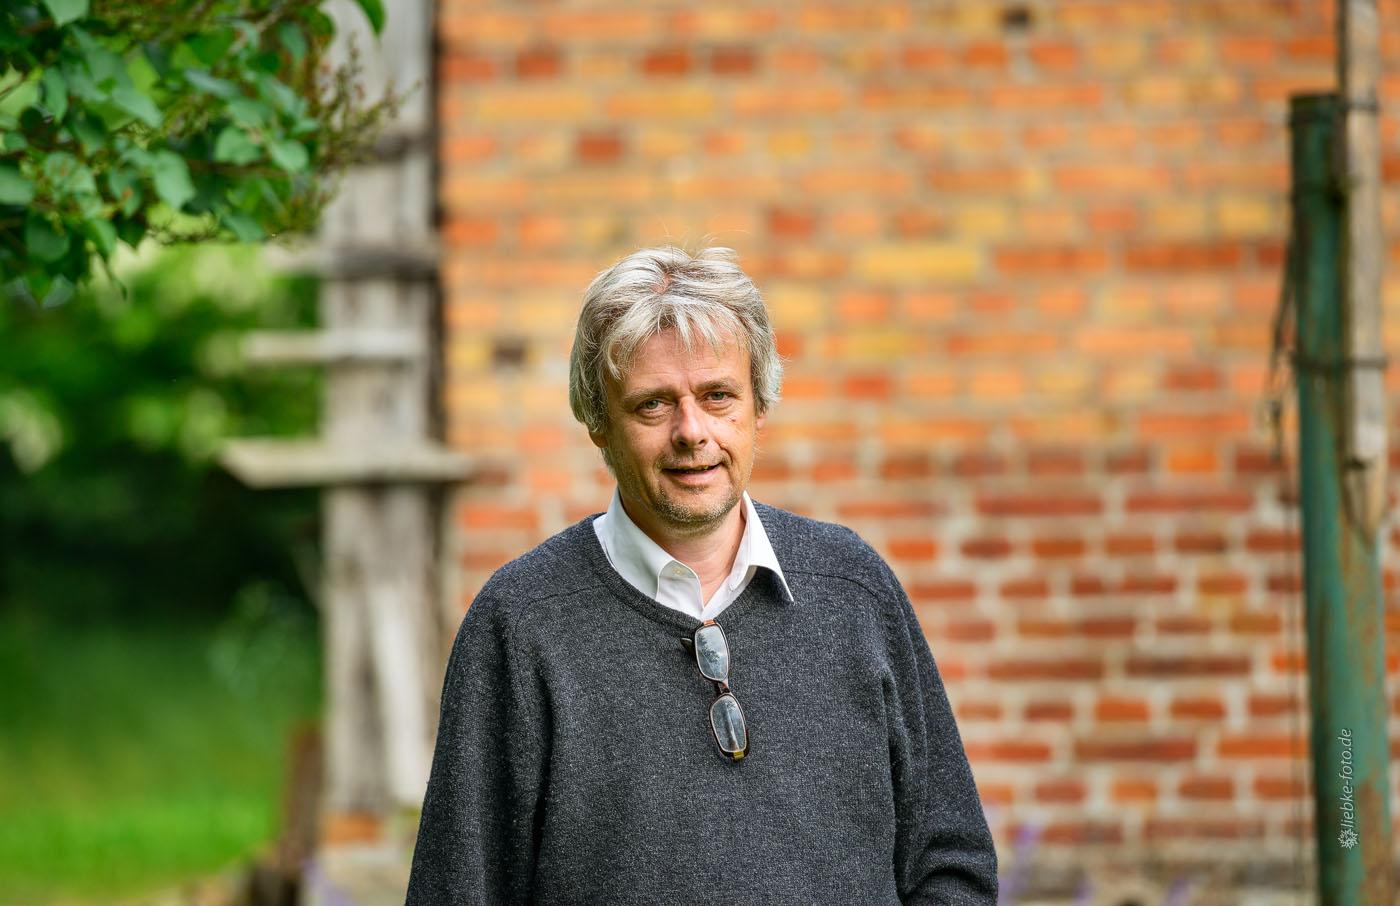 Pastor Ulrich Kasparick